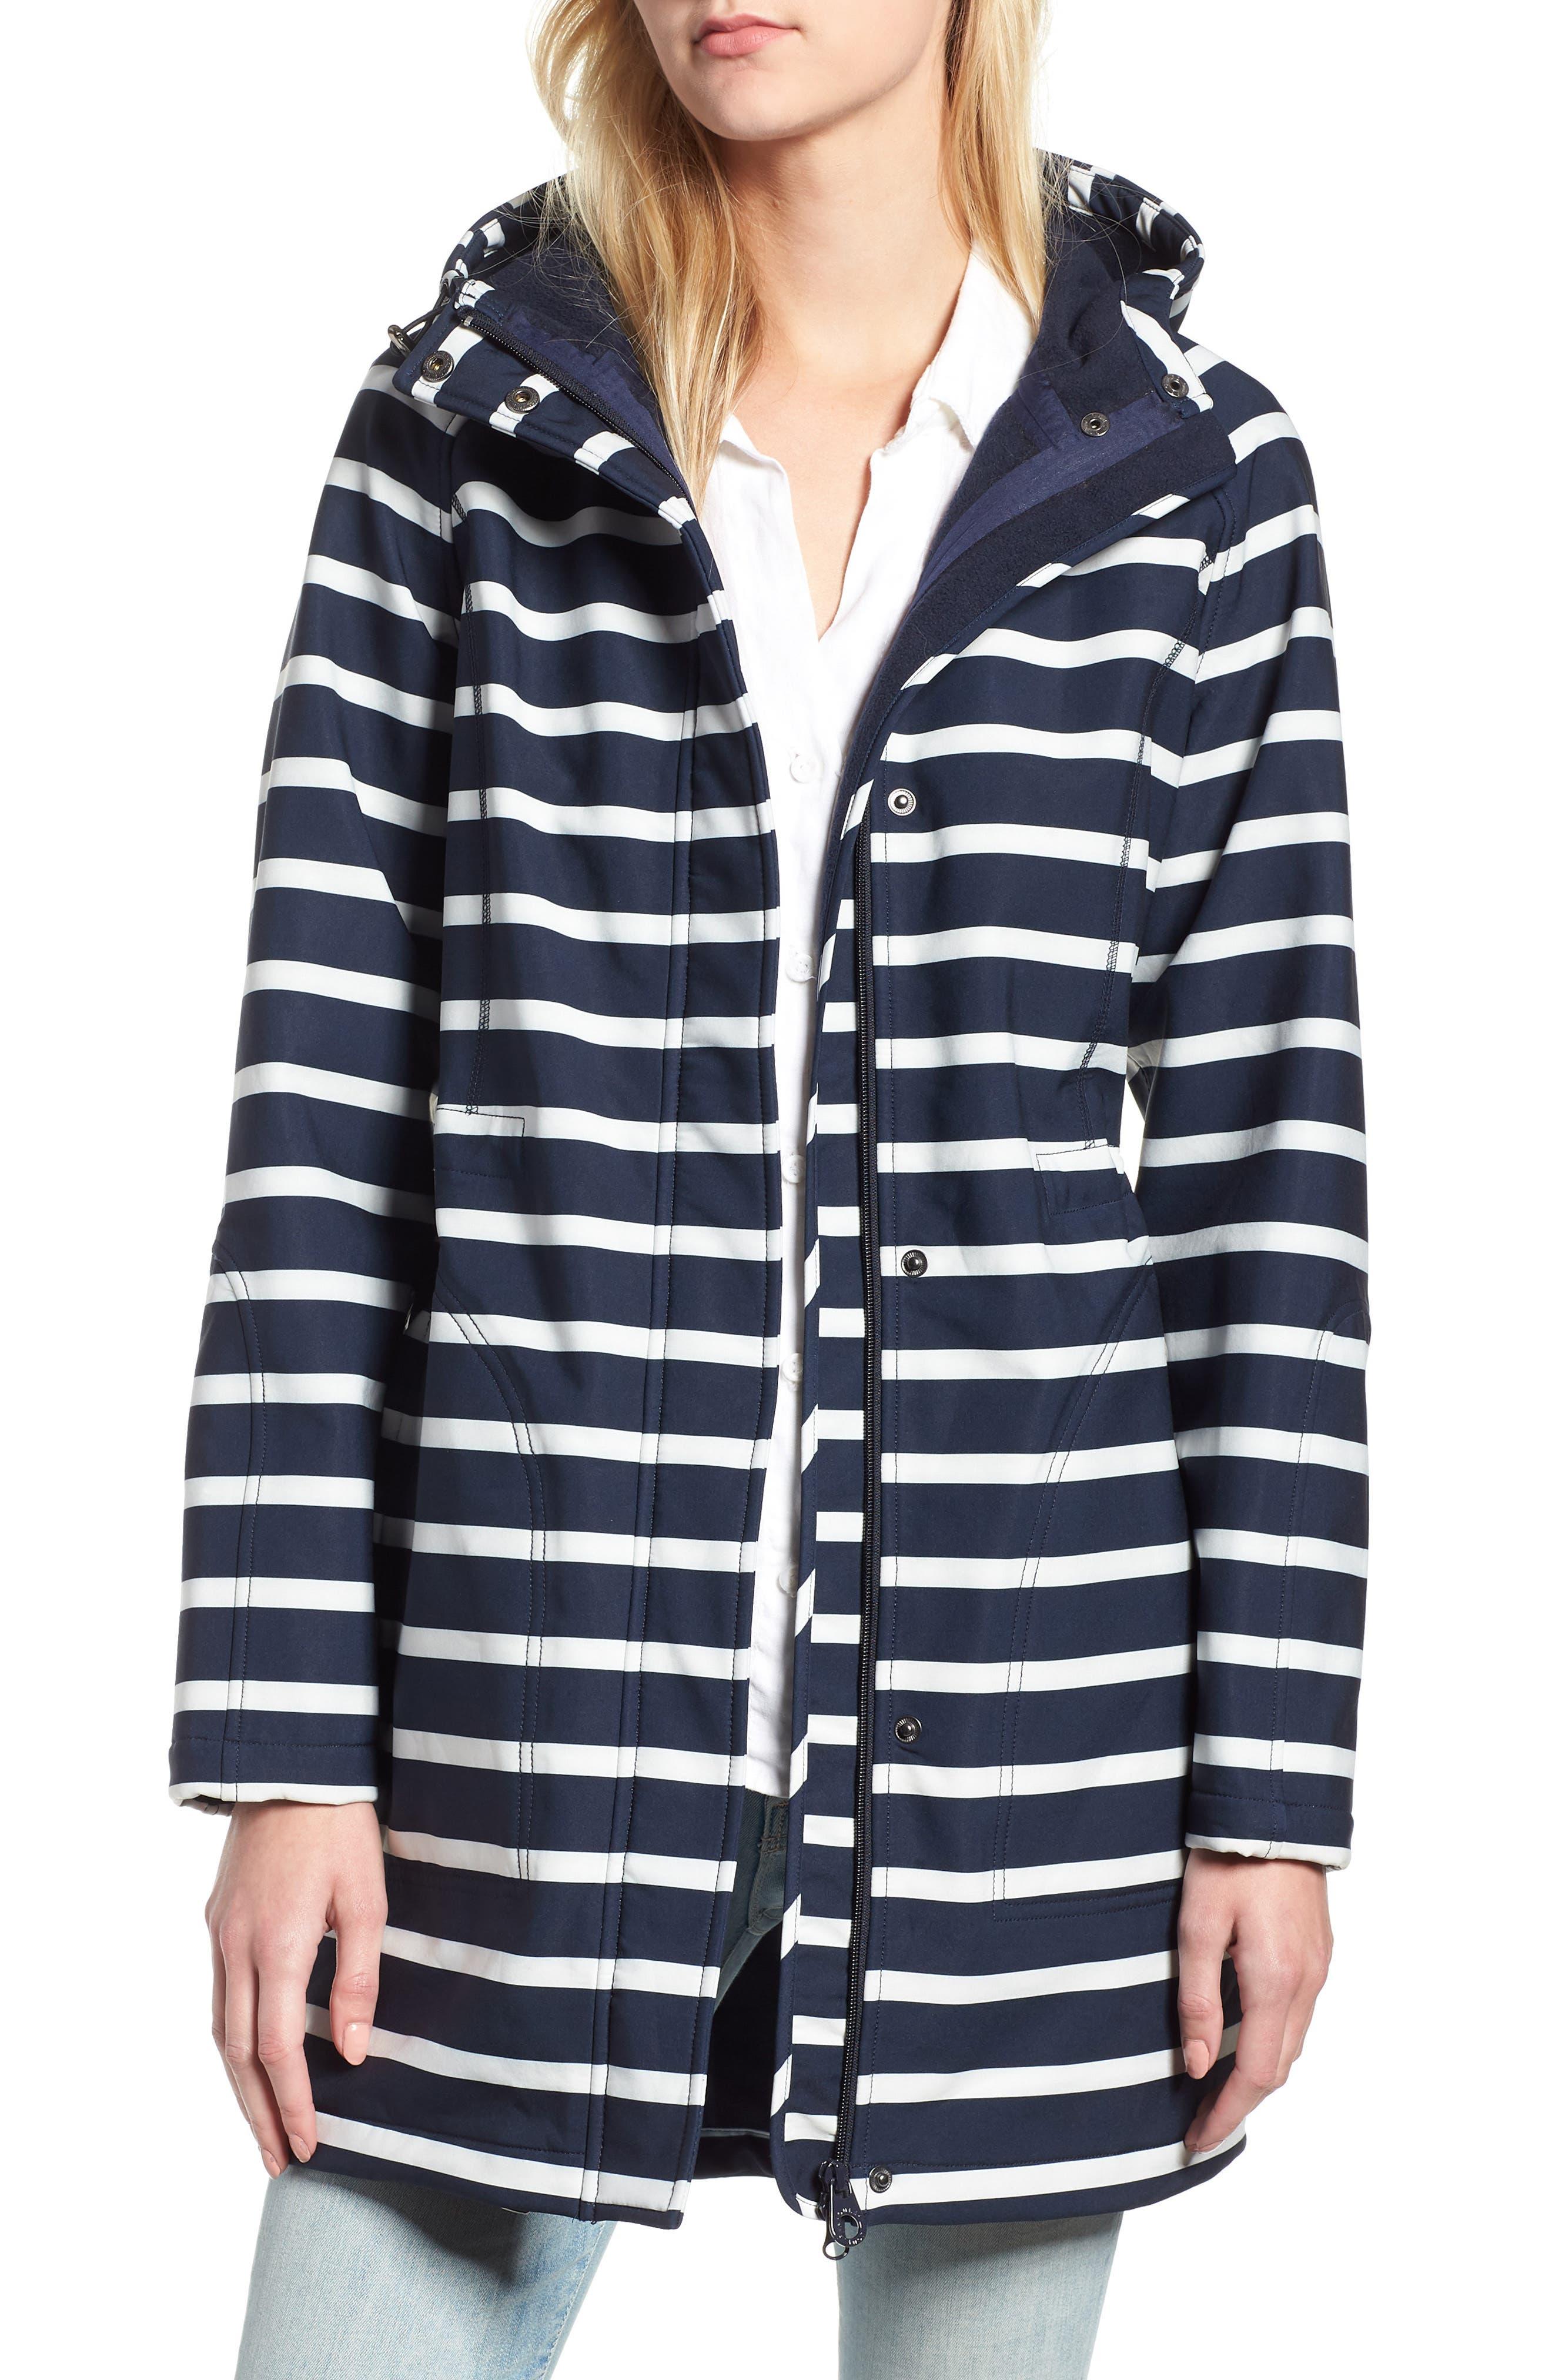 Right as Rain Fleece Lined Raincoat,                         Main,                         color, MARINE NAVY